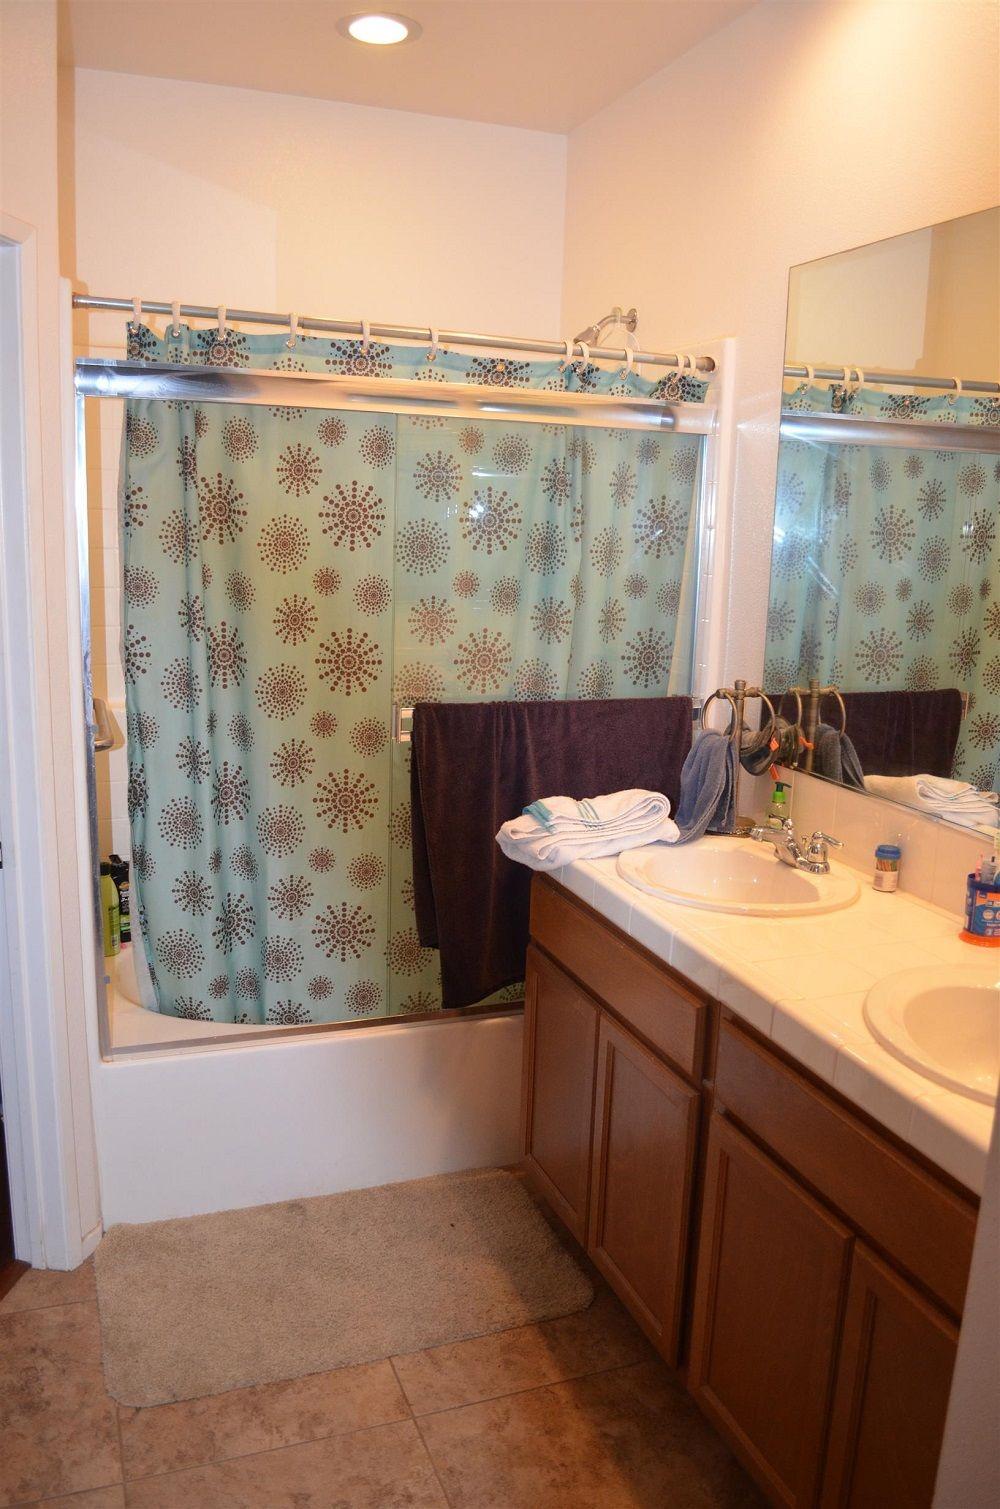 Riverpark Penthouse Condo for Sale master bathroom